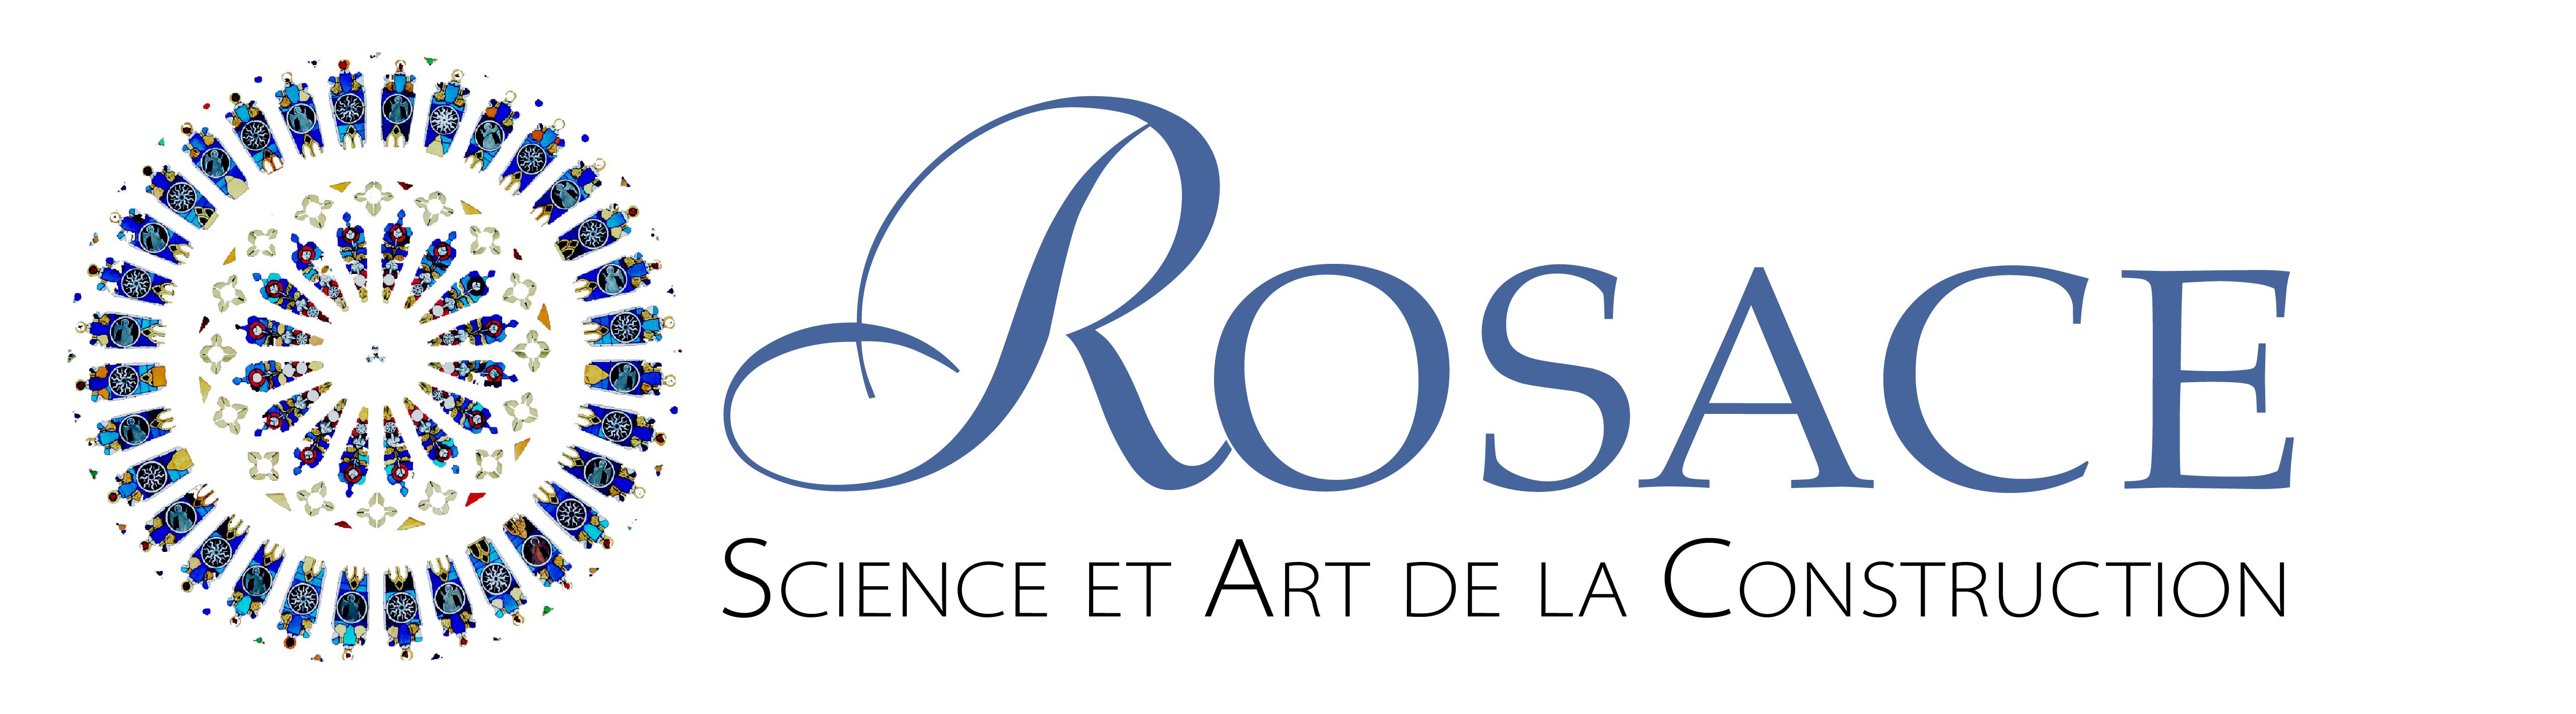 Rosace